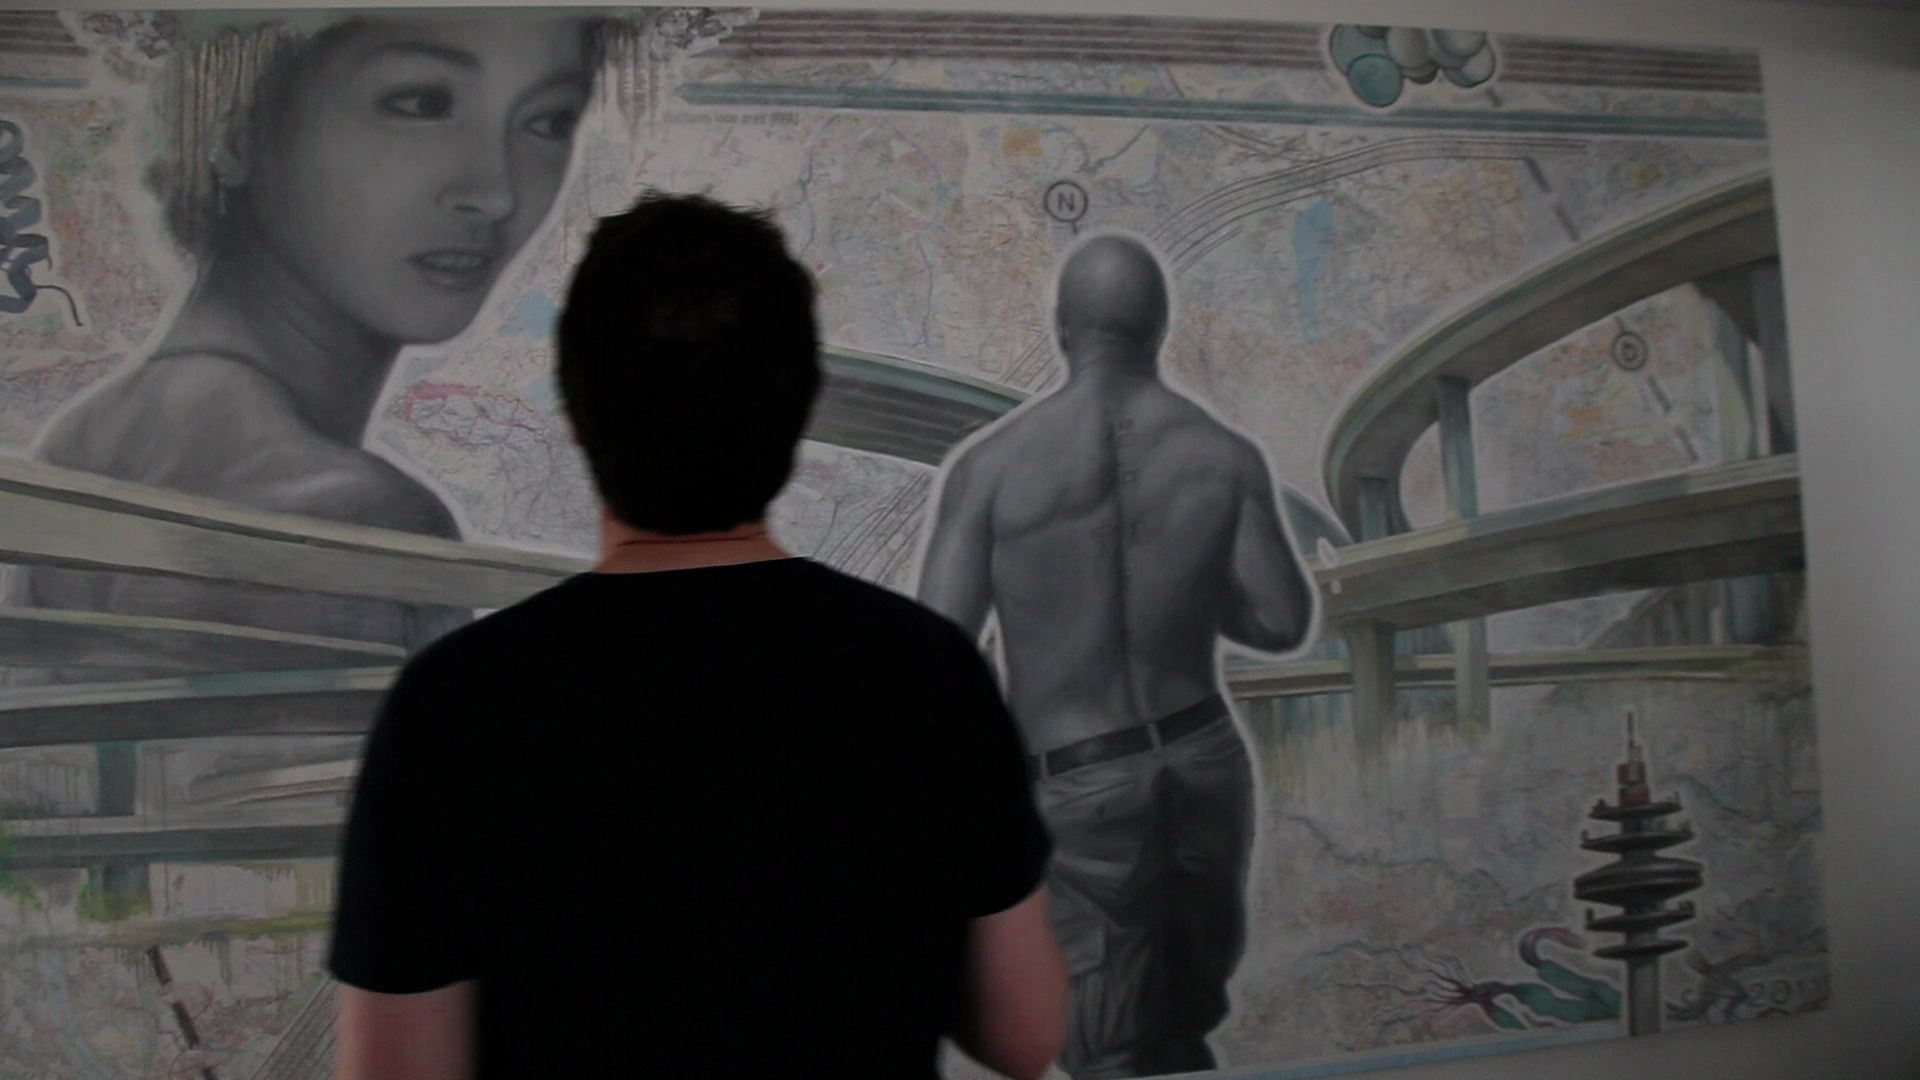 Teacher completing work of art